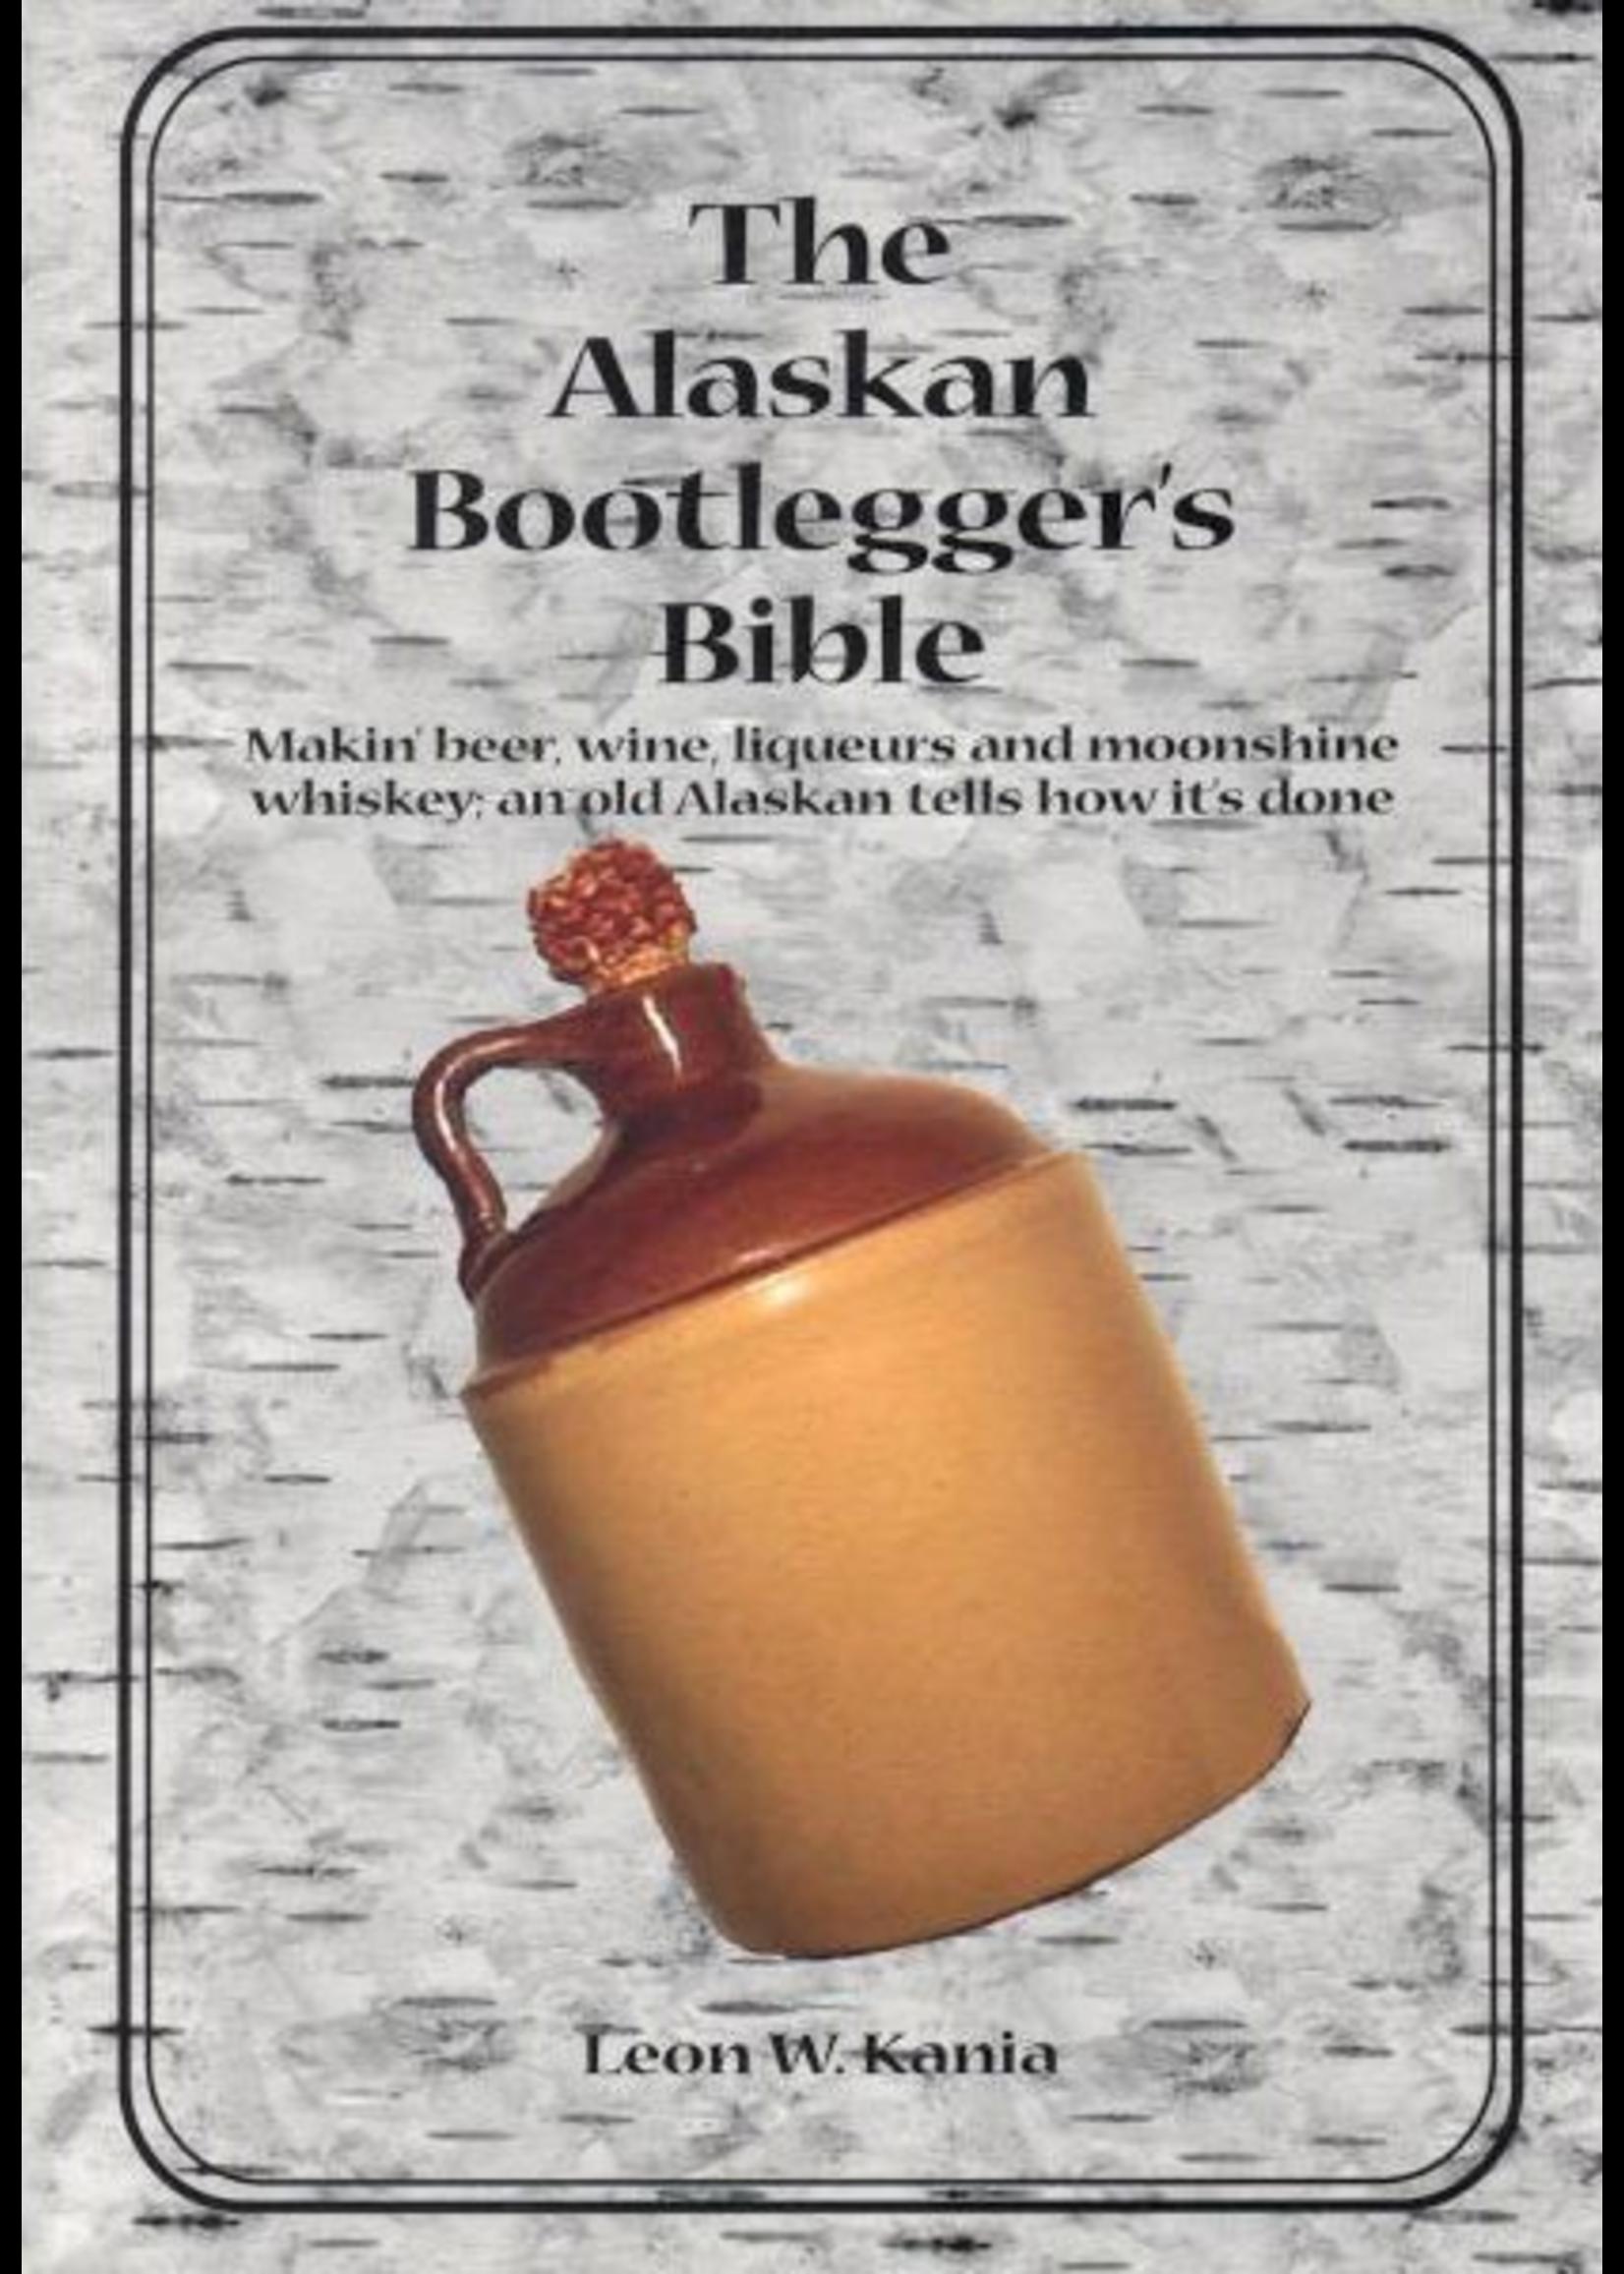 Books Alaskan Bootlegger's Bible